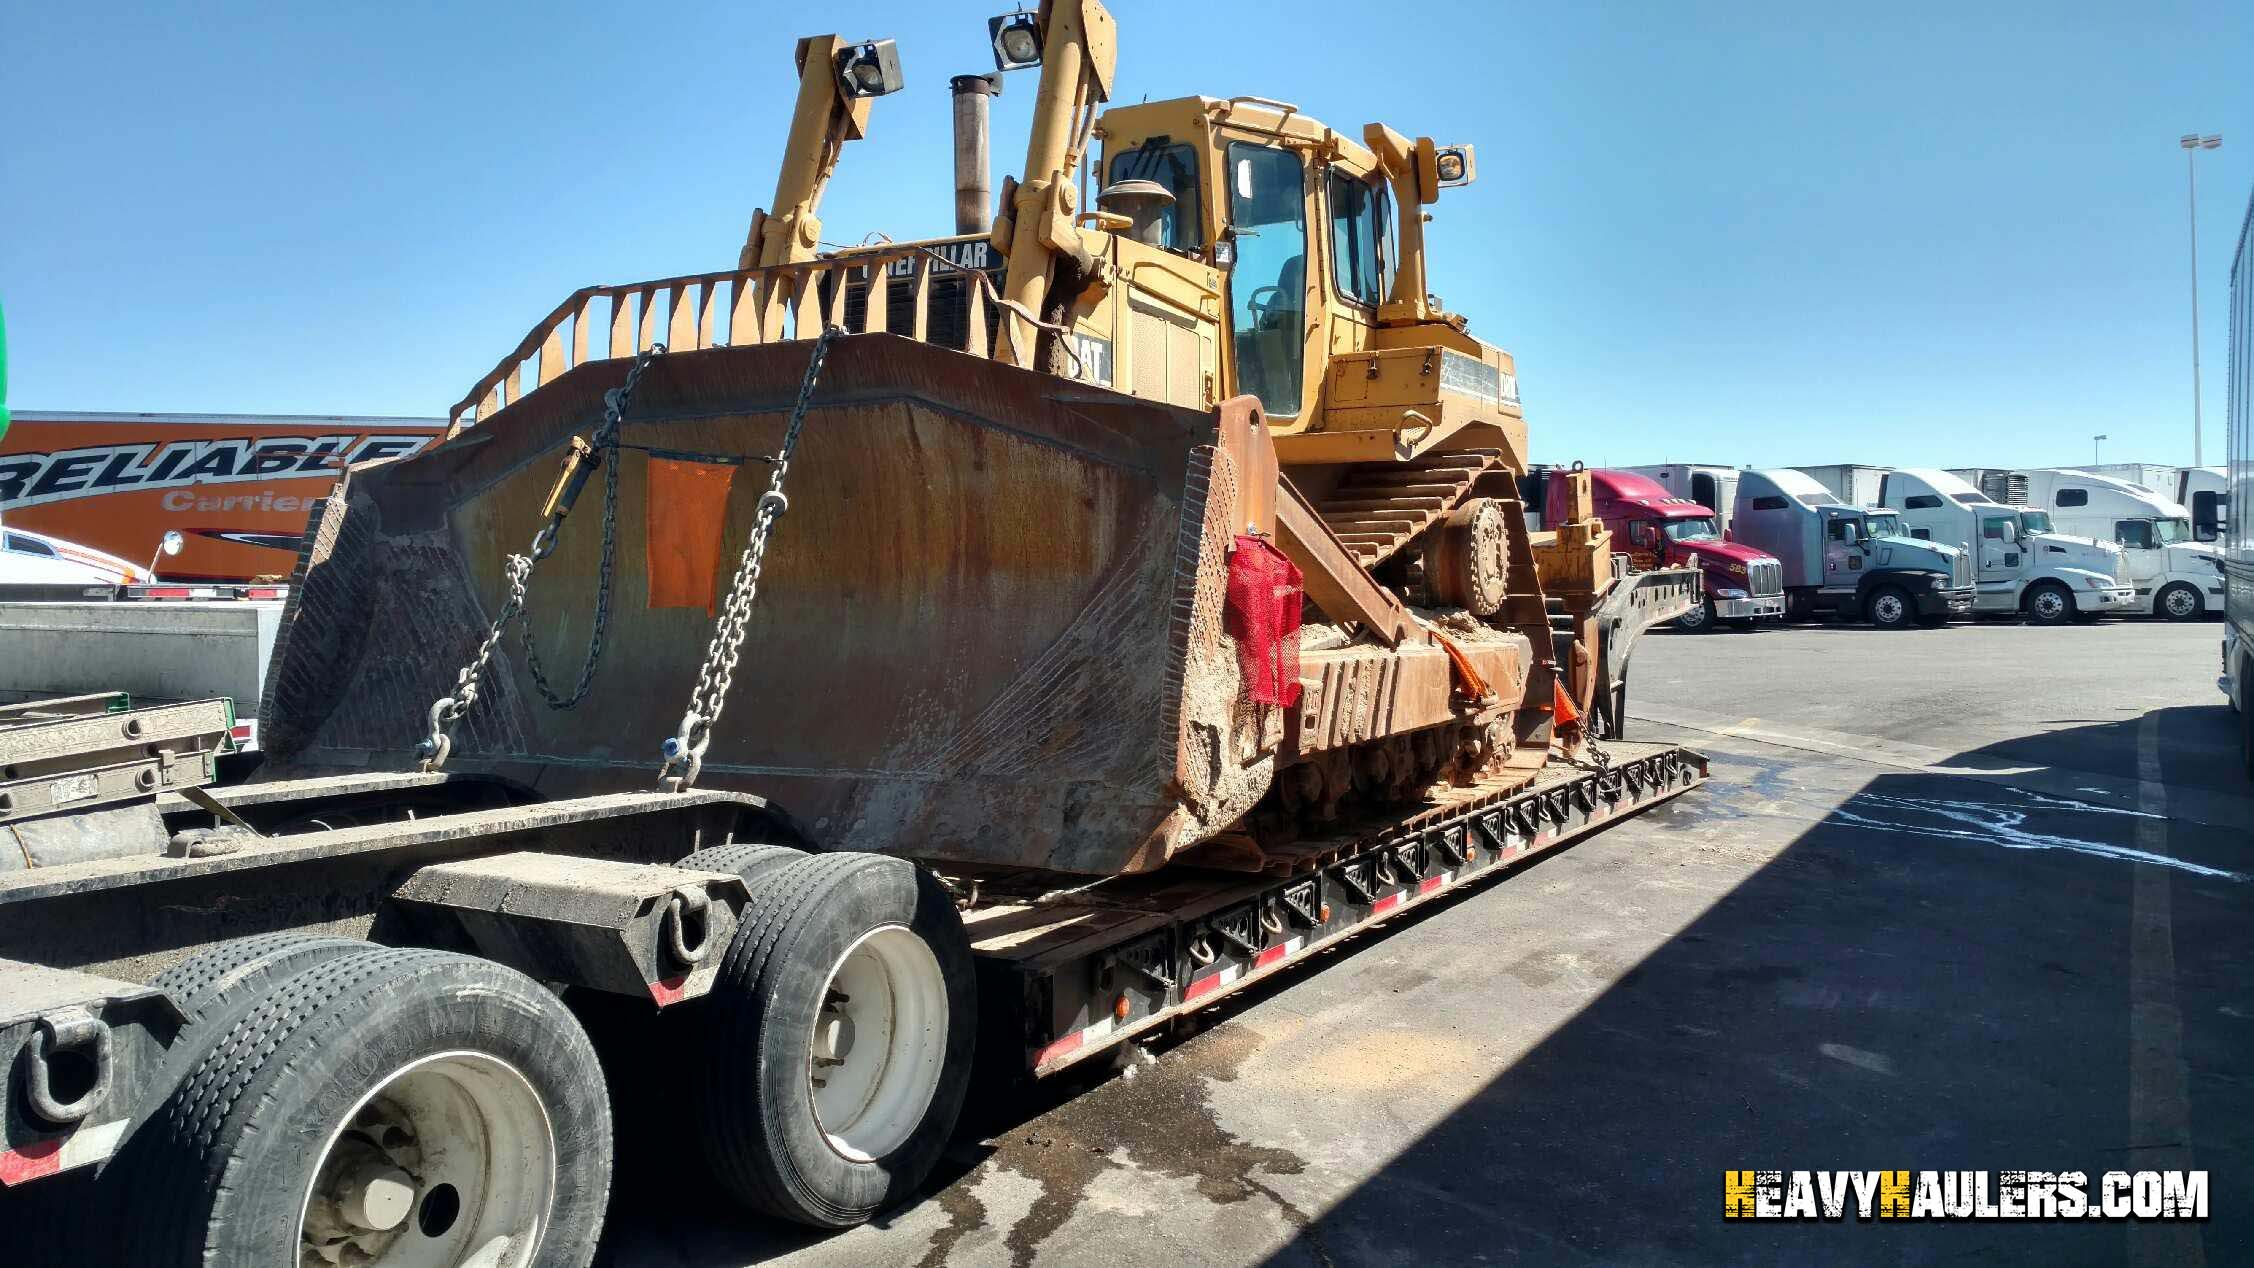 Bulldozer Transport Services | Heavy Haulers | (800) 908-6206